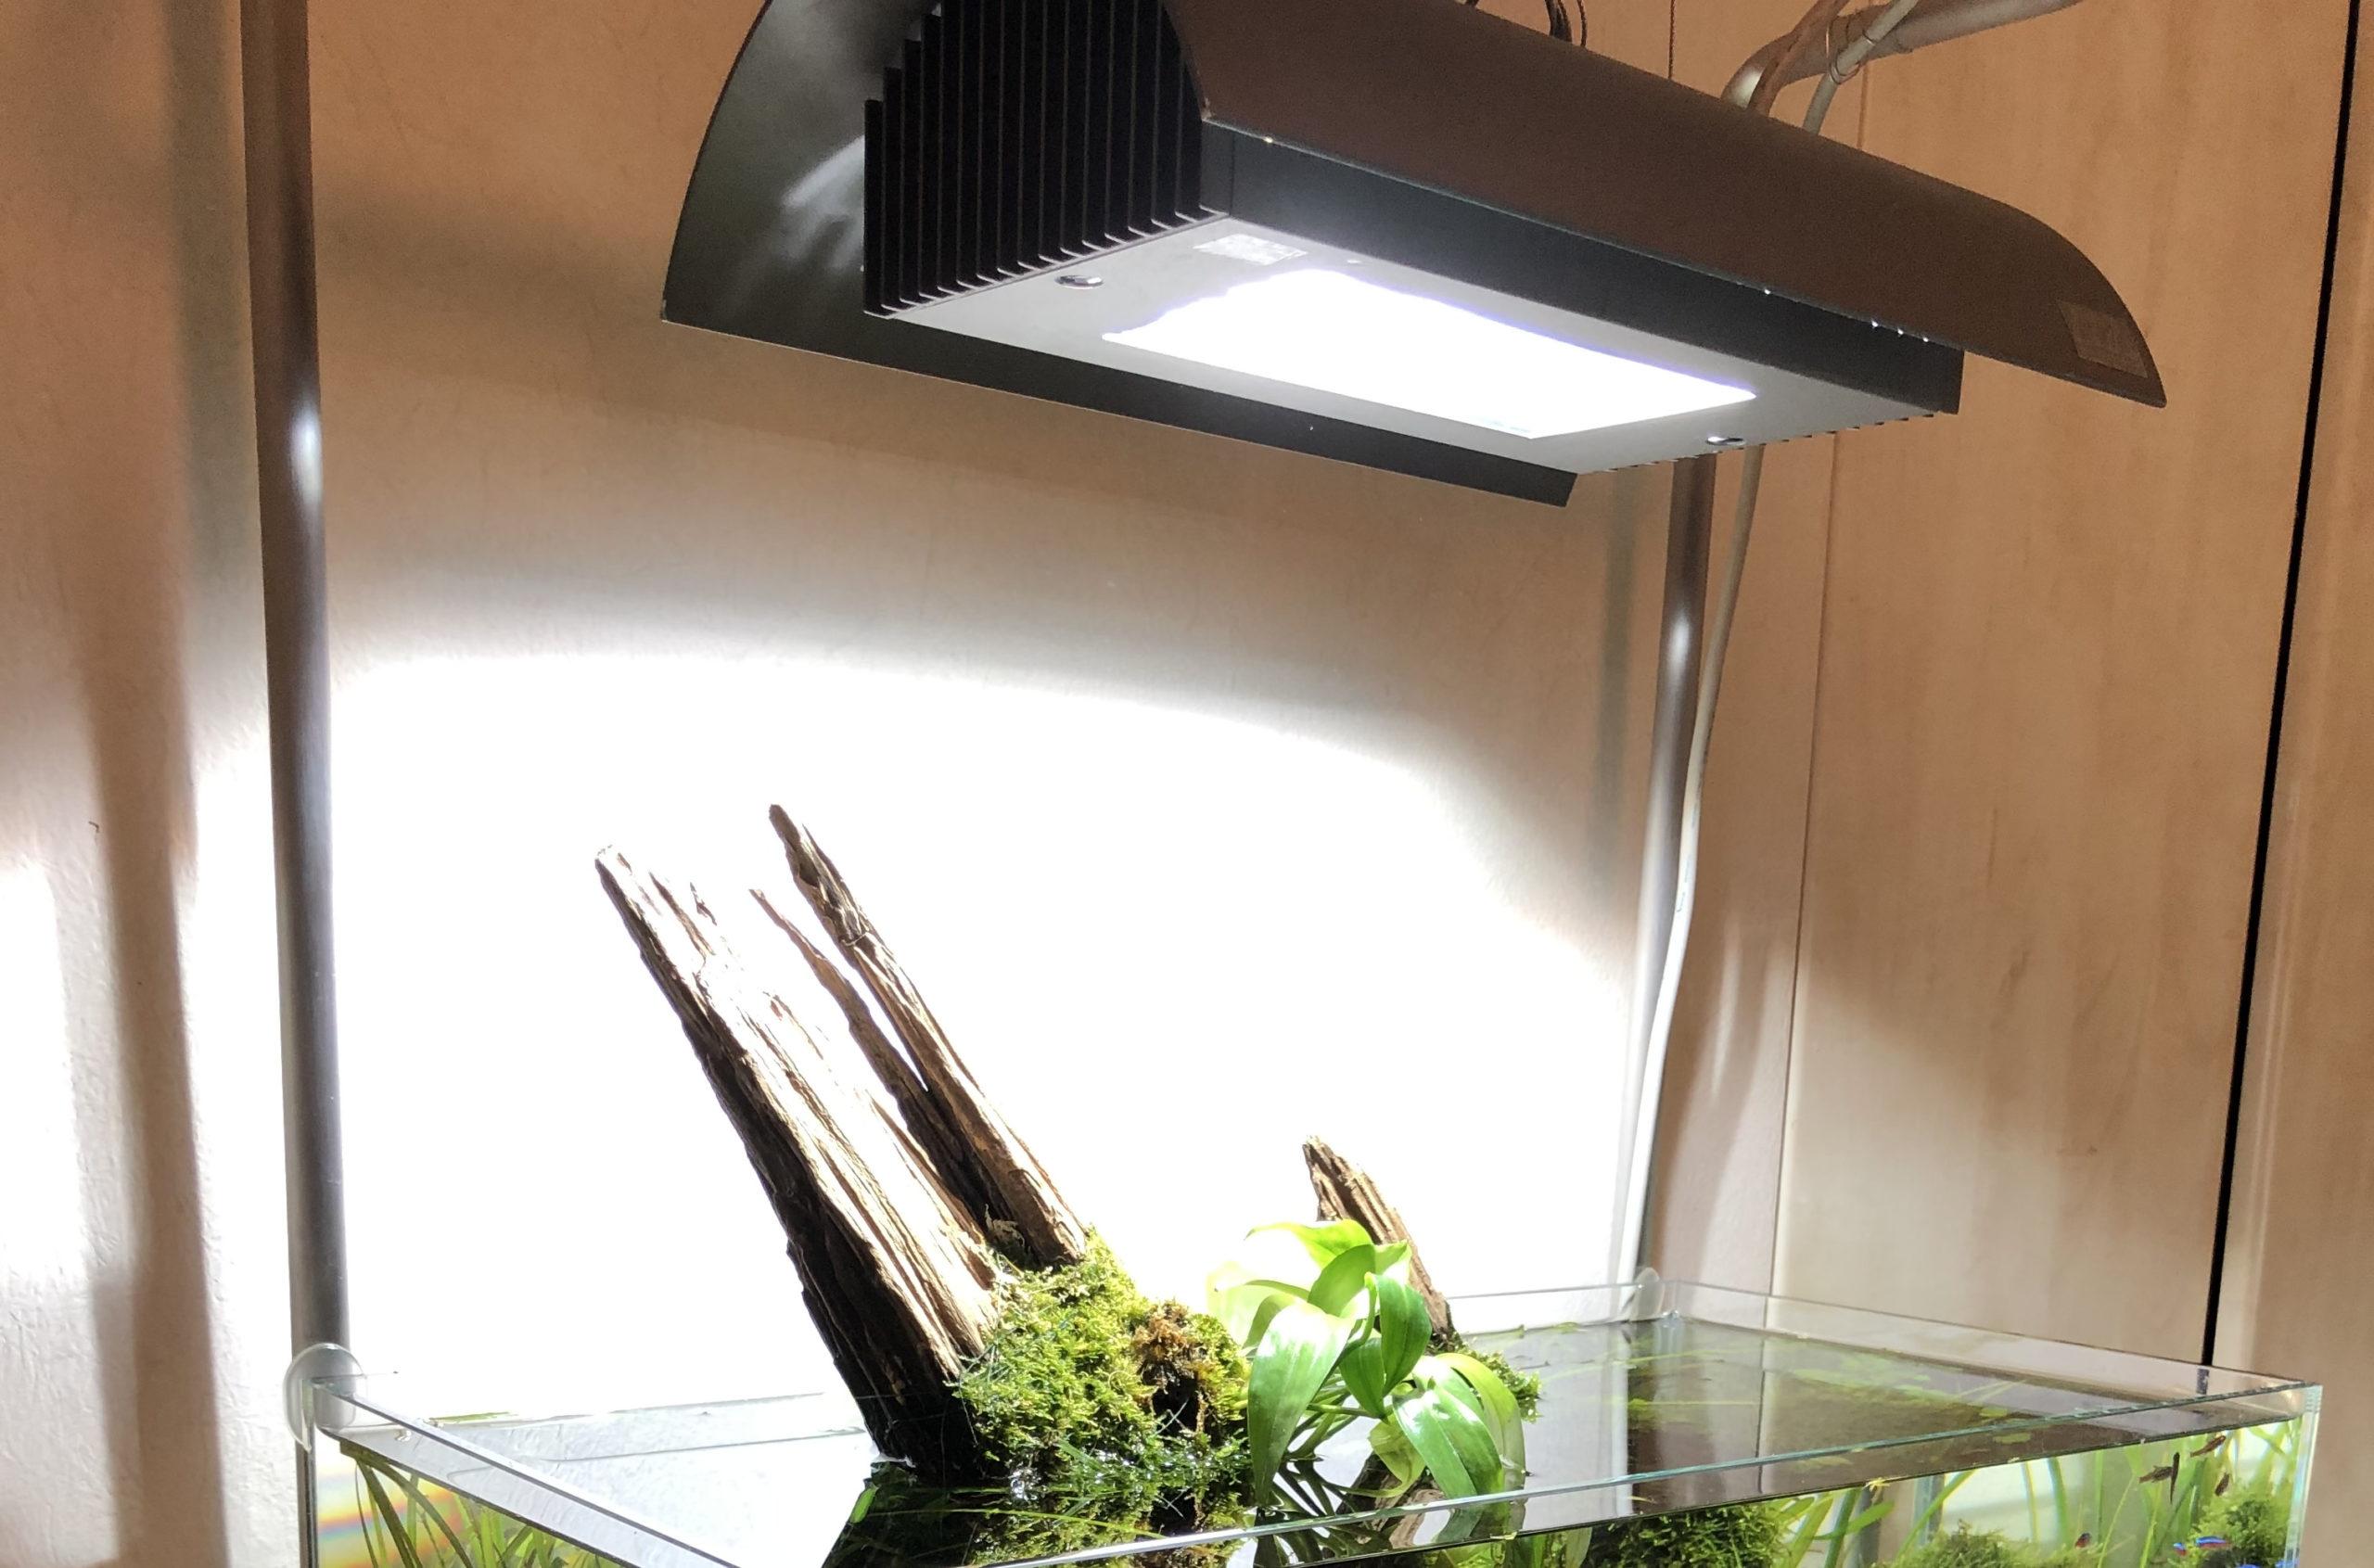 Should You Still Buy Metal Halide Lamp for Your Aquarium in 2021?